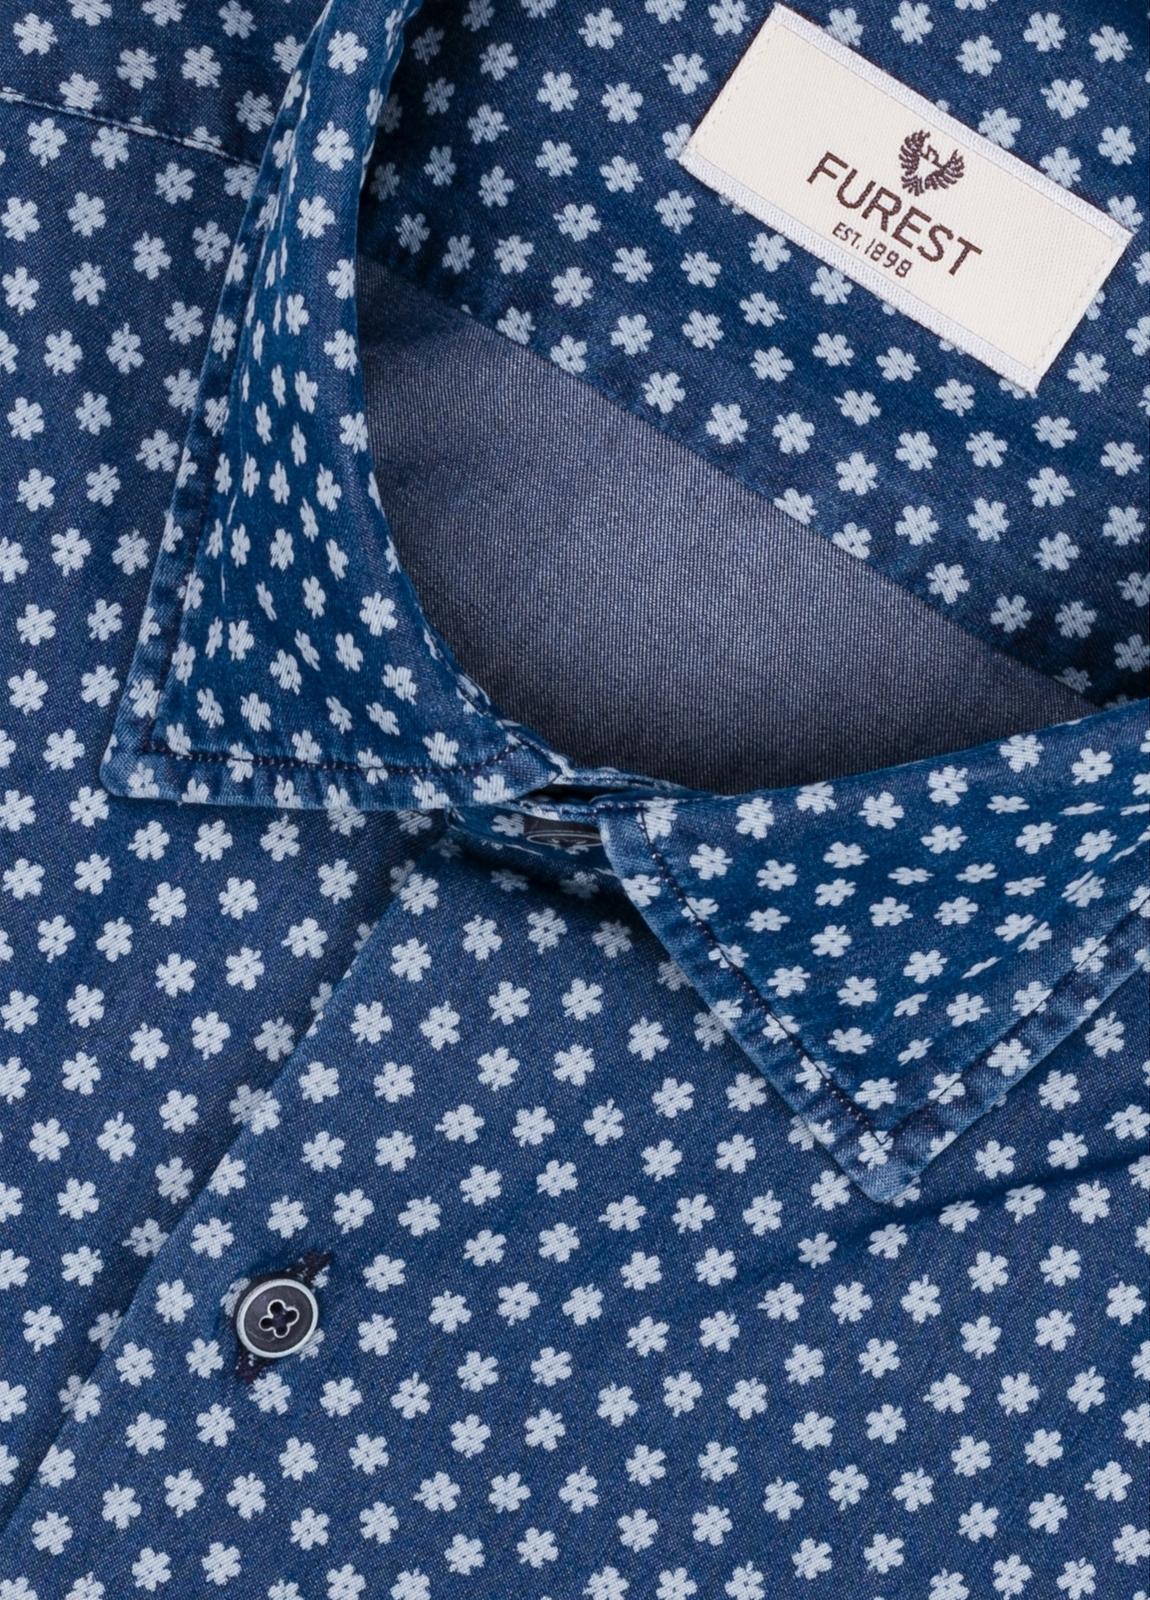 Camisa Leisure Wear SLIM FIT modelo PORTO dibujo floral, color azul. 100% Algodón. - Ítem4